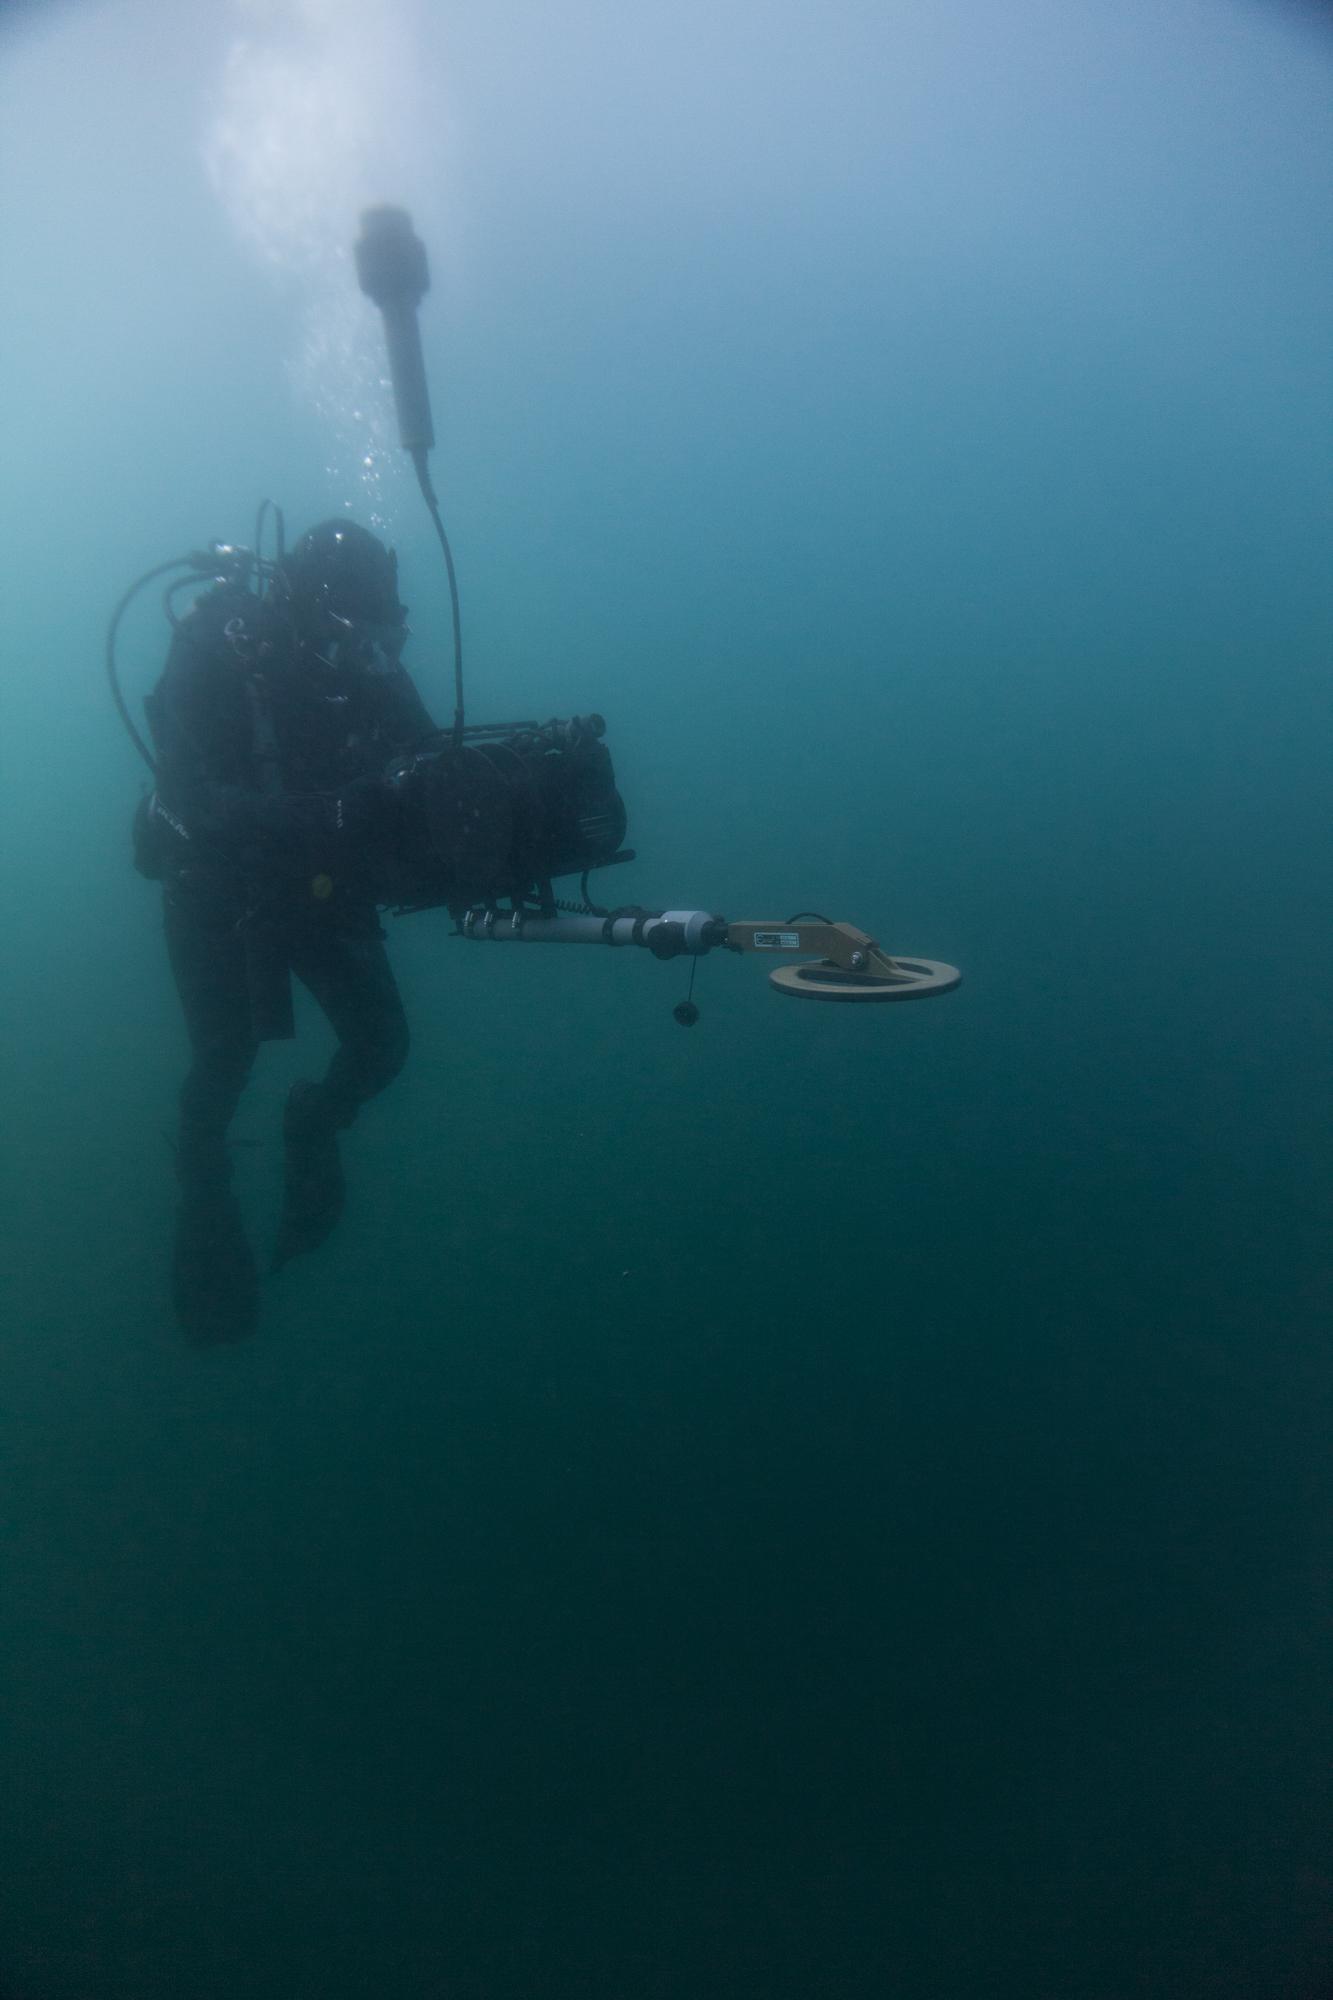 Jim Honey of Shark Marine operating his Diver Navigation system with Multi-beam sonar and Metal Detector